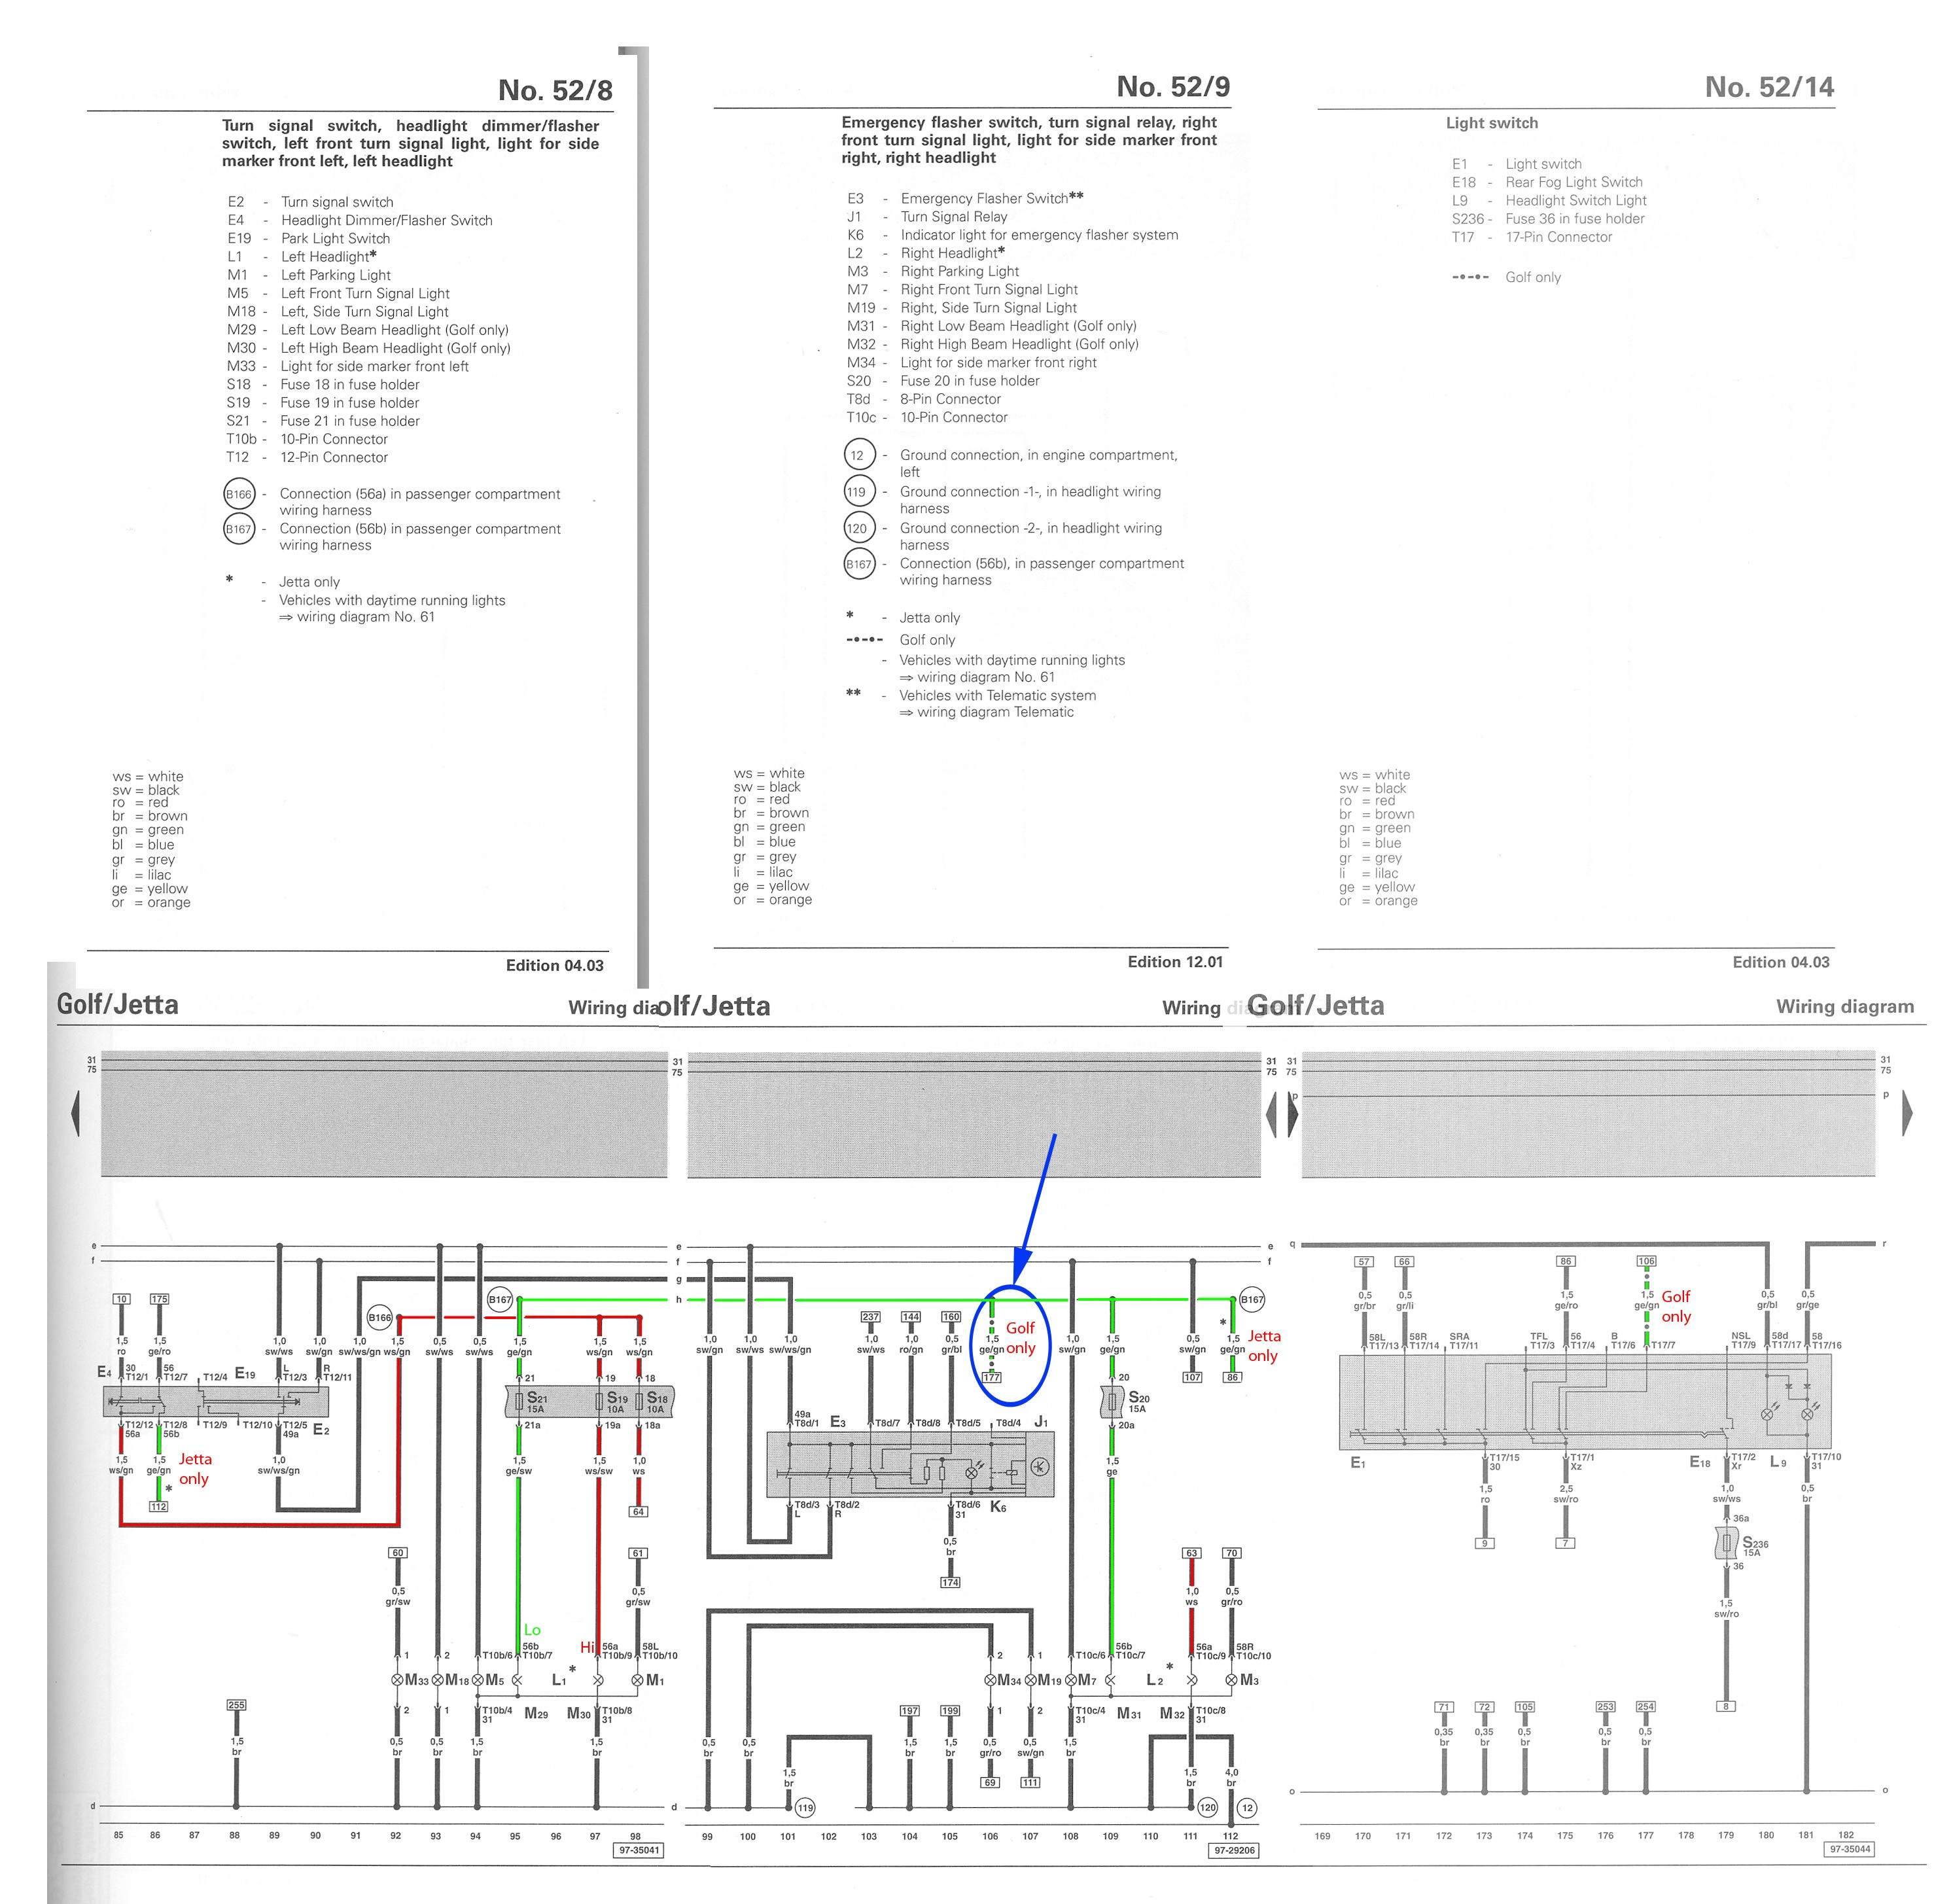 Vw Passat Wiring Diagram Amazing Vw touran Wiring Diagram Ideas Everything You Need to Know Of Vw Passat Wiring Diagram